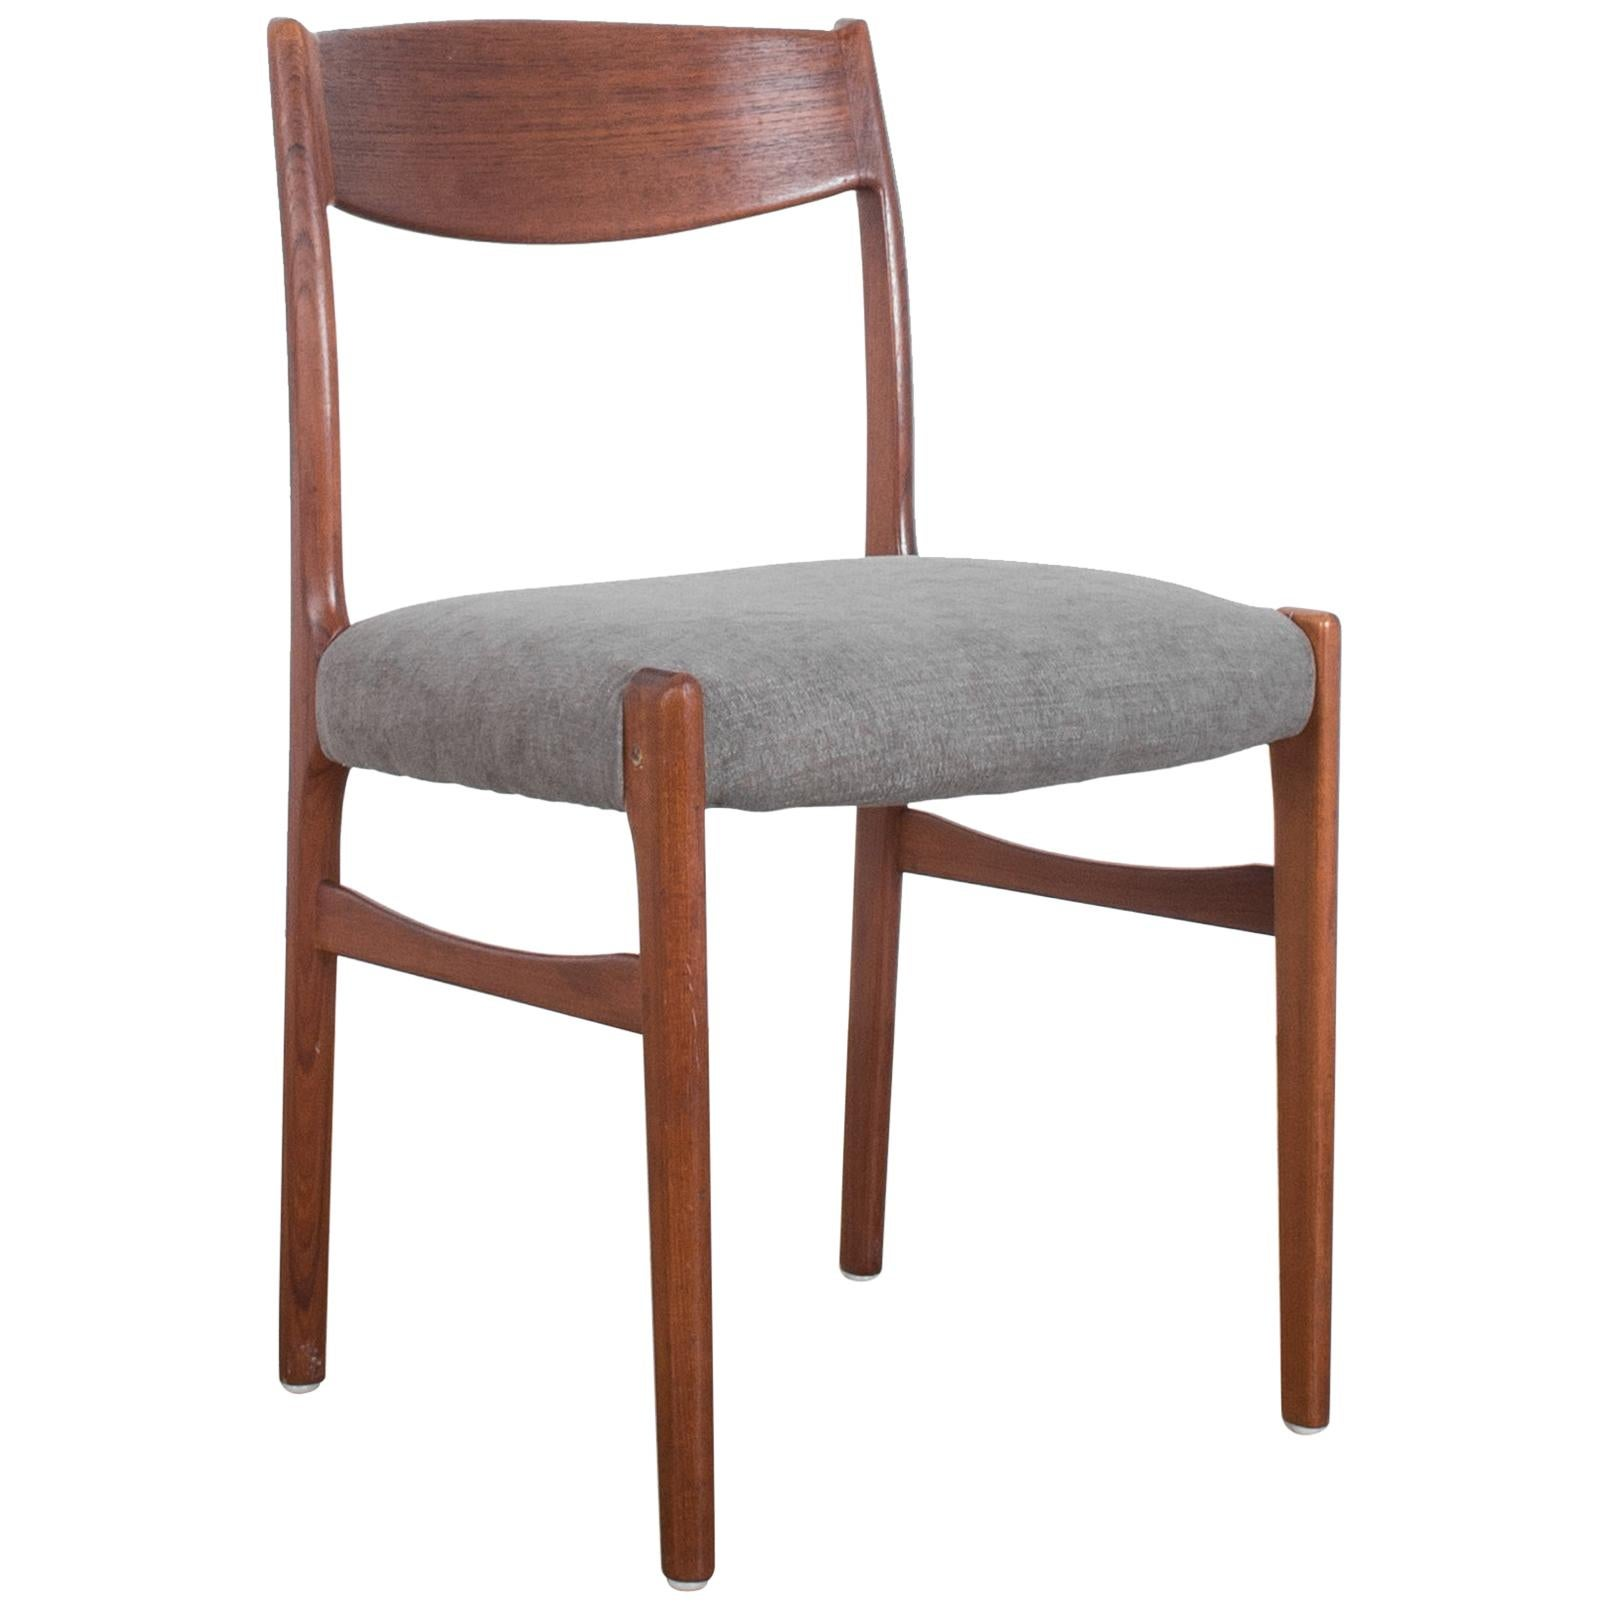 1960s Danish Upholstered Chair